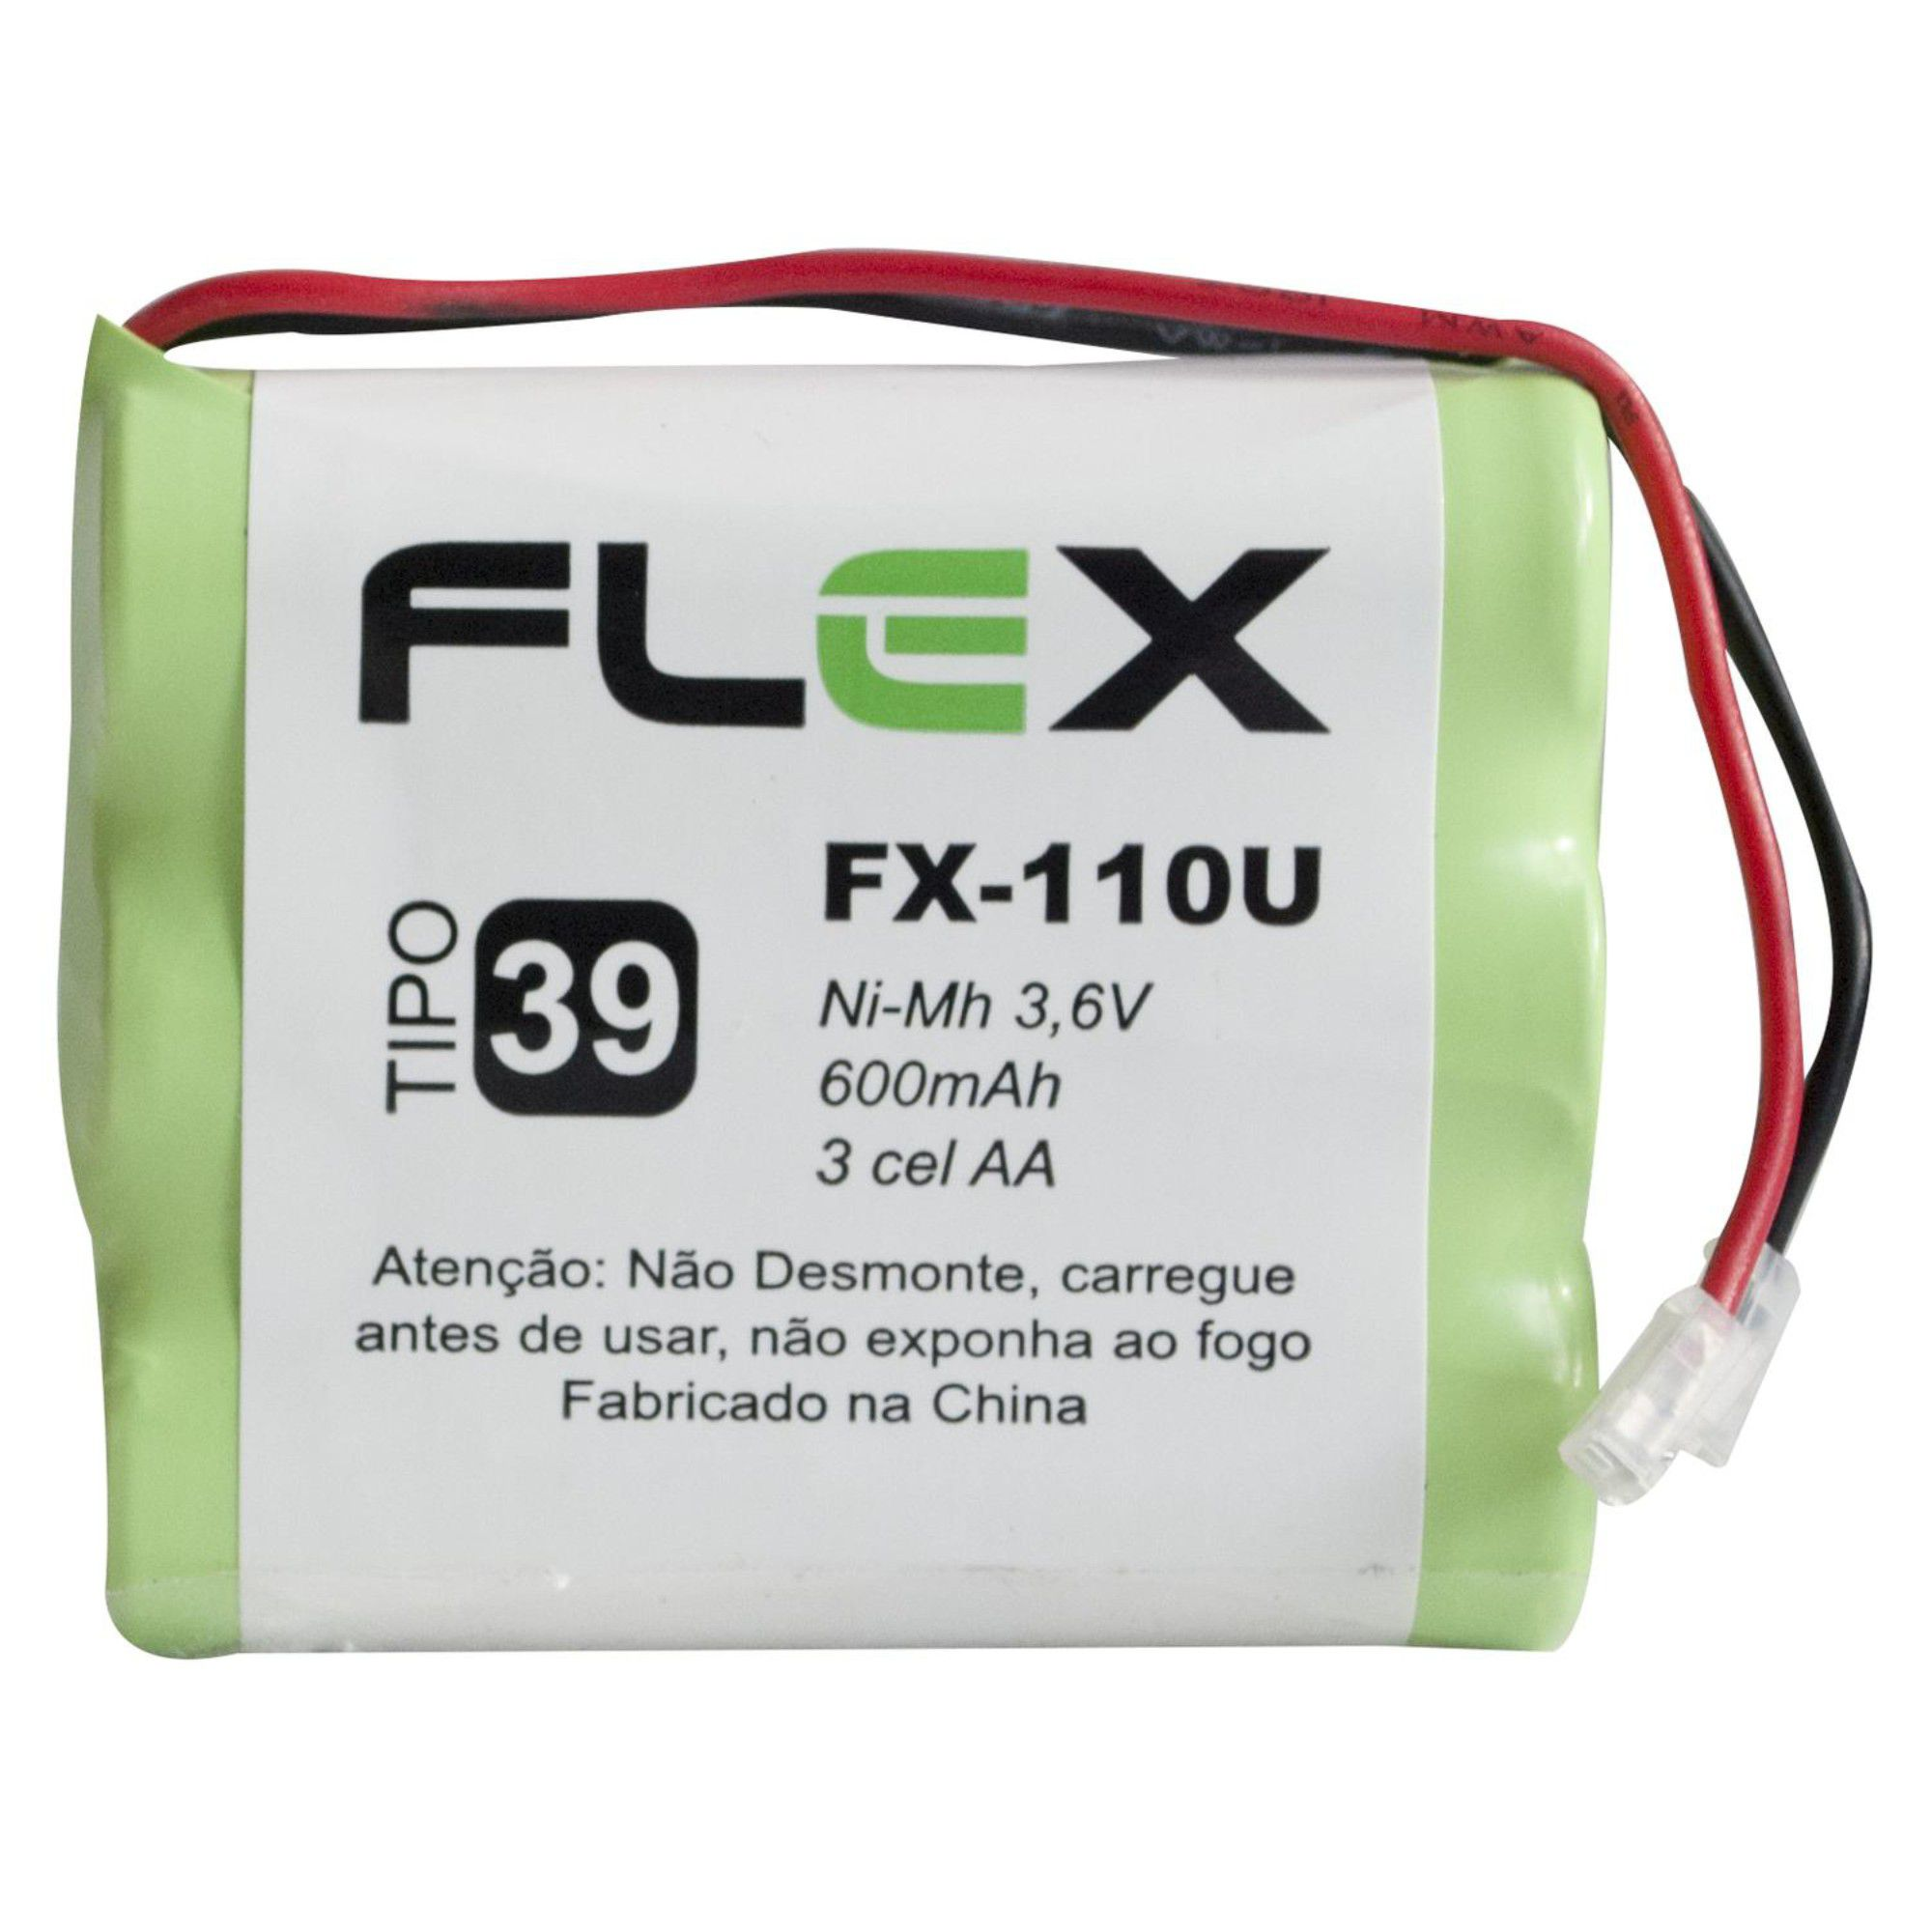 Bateria Telefone Sem Fio Ni-Cd 3.6v 600mah Fx-110u